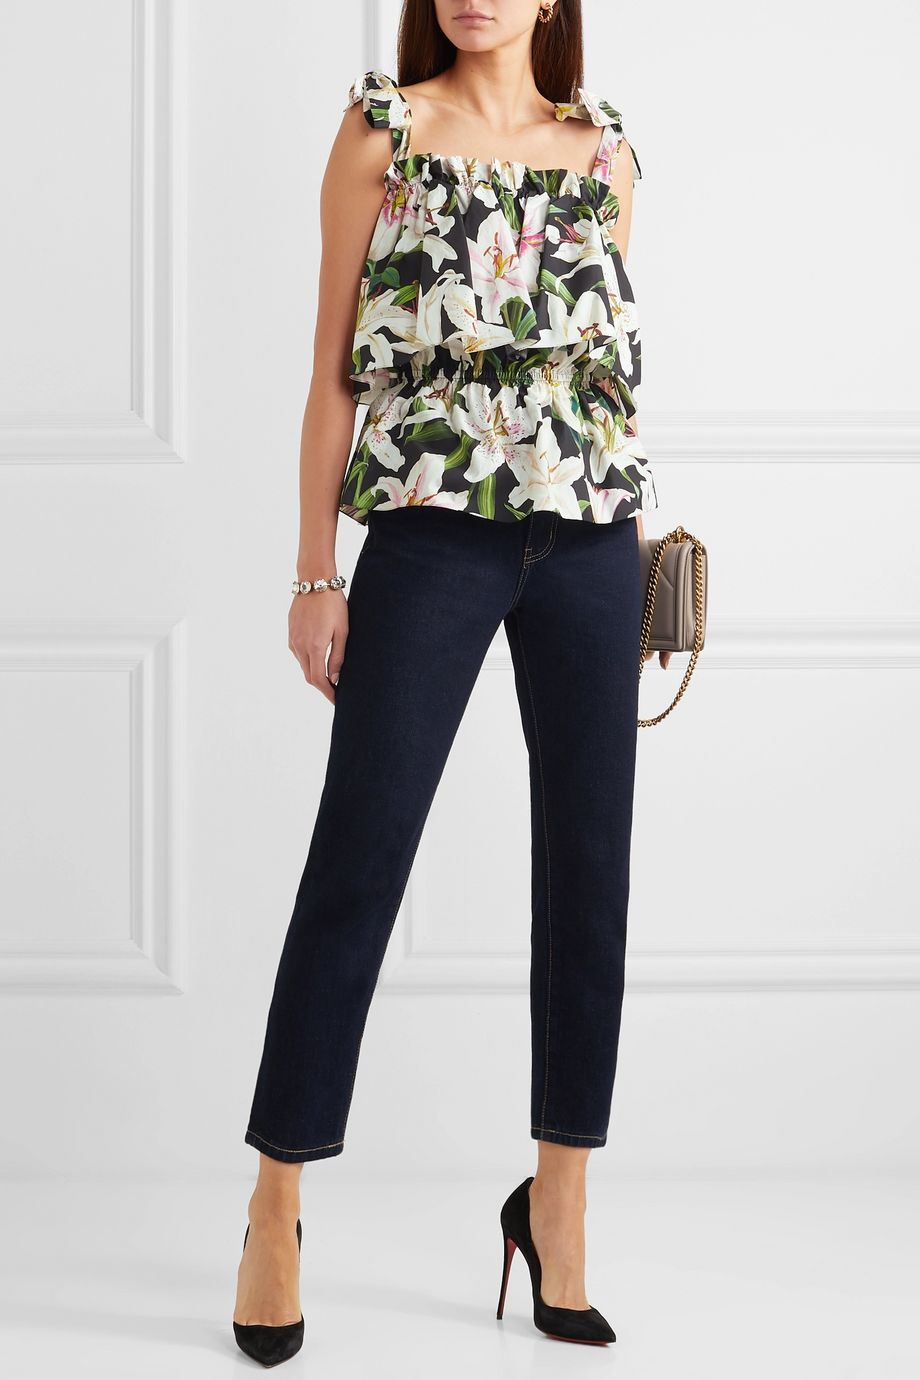 Dolce & Gabbana Floral-print cotton-poplin top